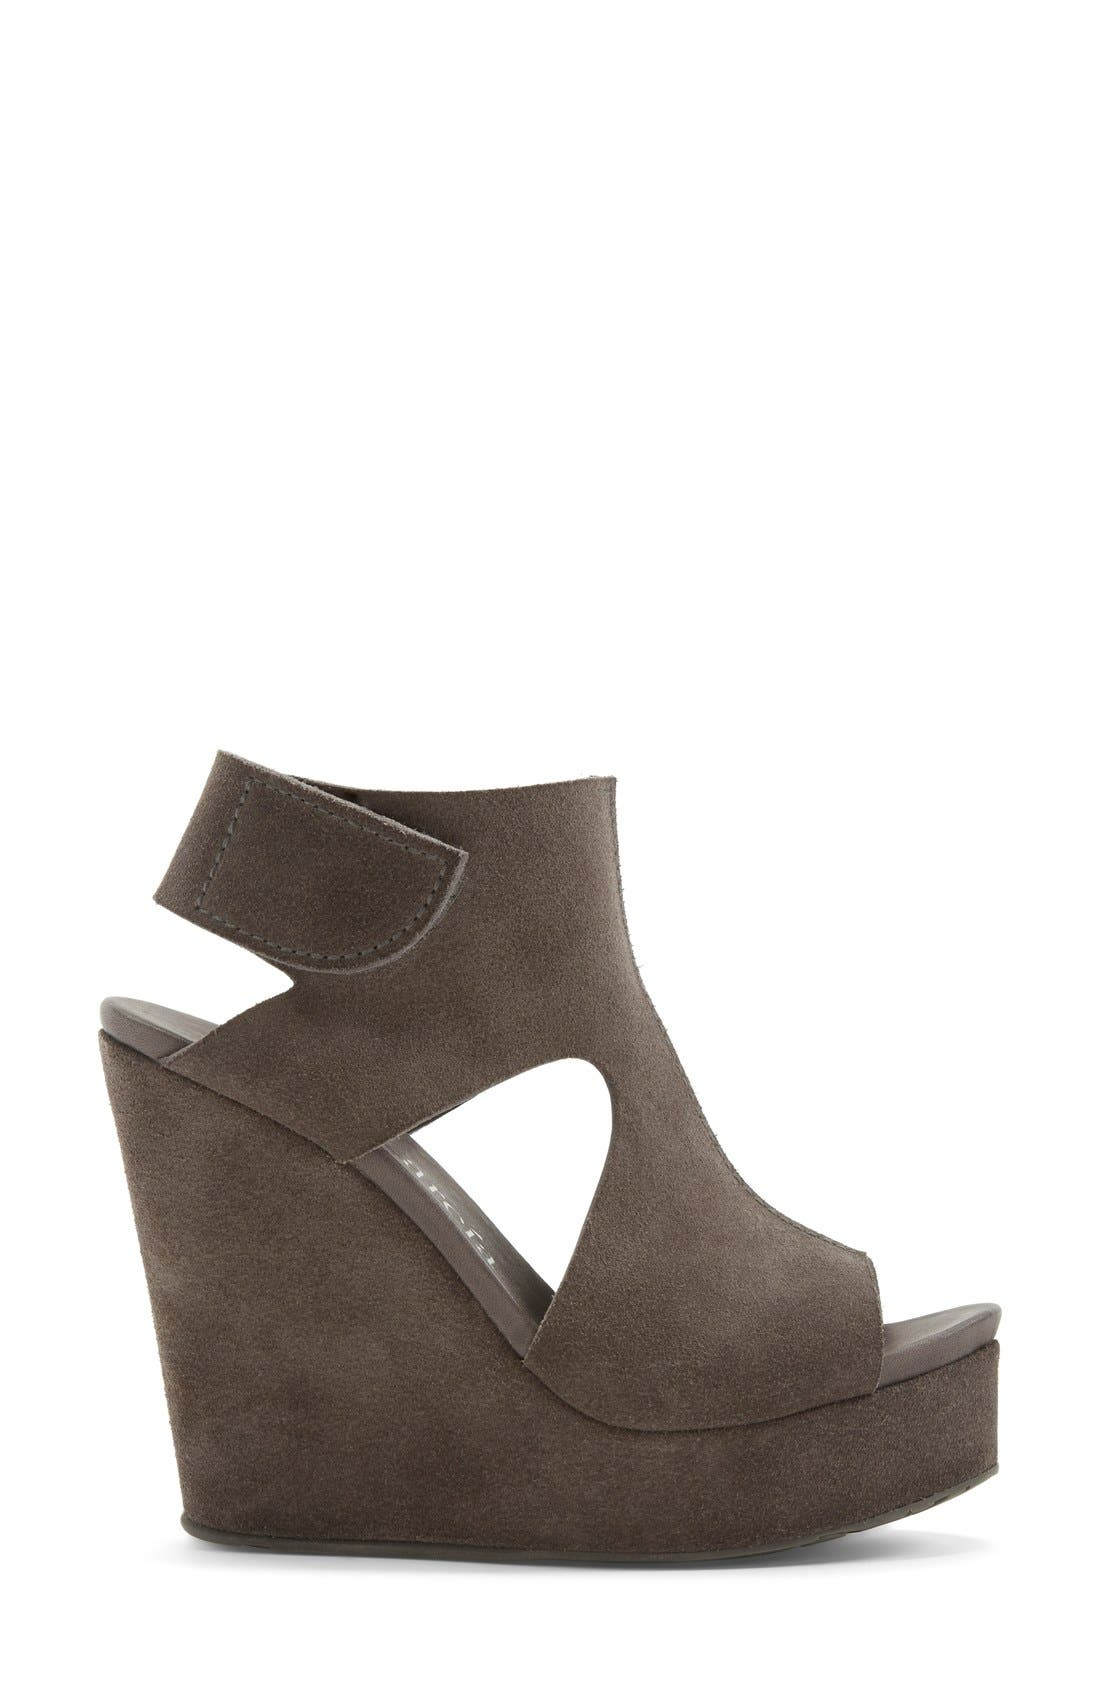 Alternate Image 4  - Pedro Garcia 'Terence' Platform Wedge Sandal (Women) (Nordstrom Exclusive)